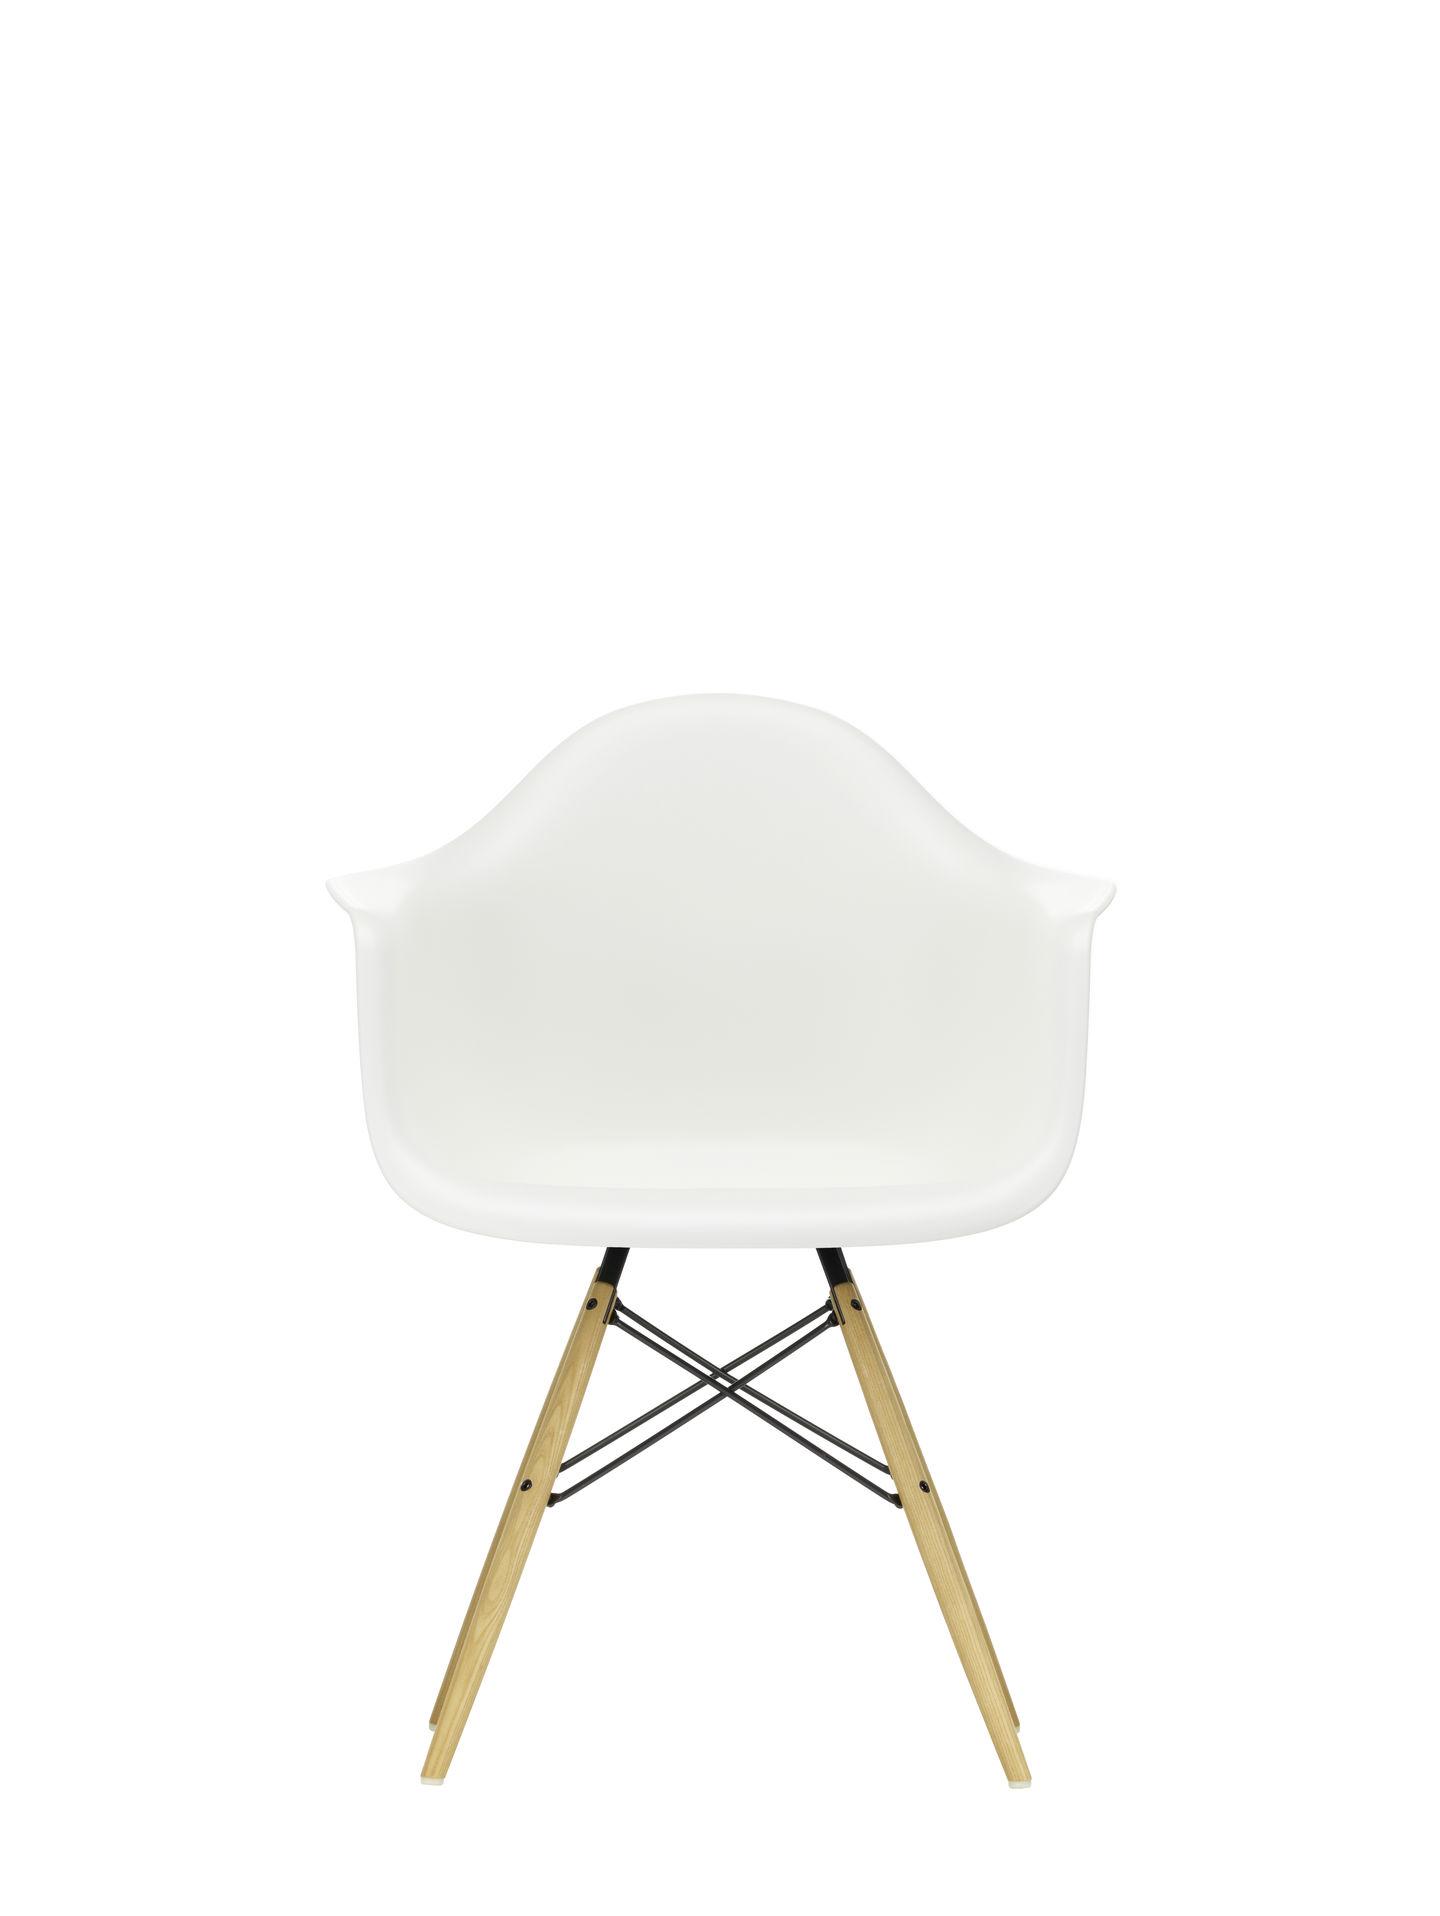 Vitra Stuhl Eames Plastic Armchair DAW weiß Esche Quickship